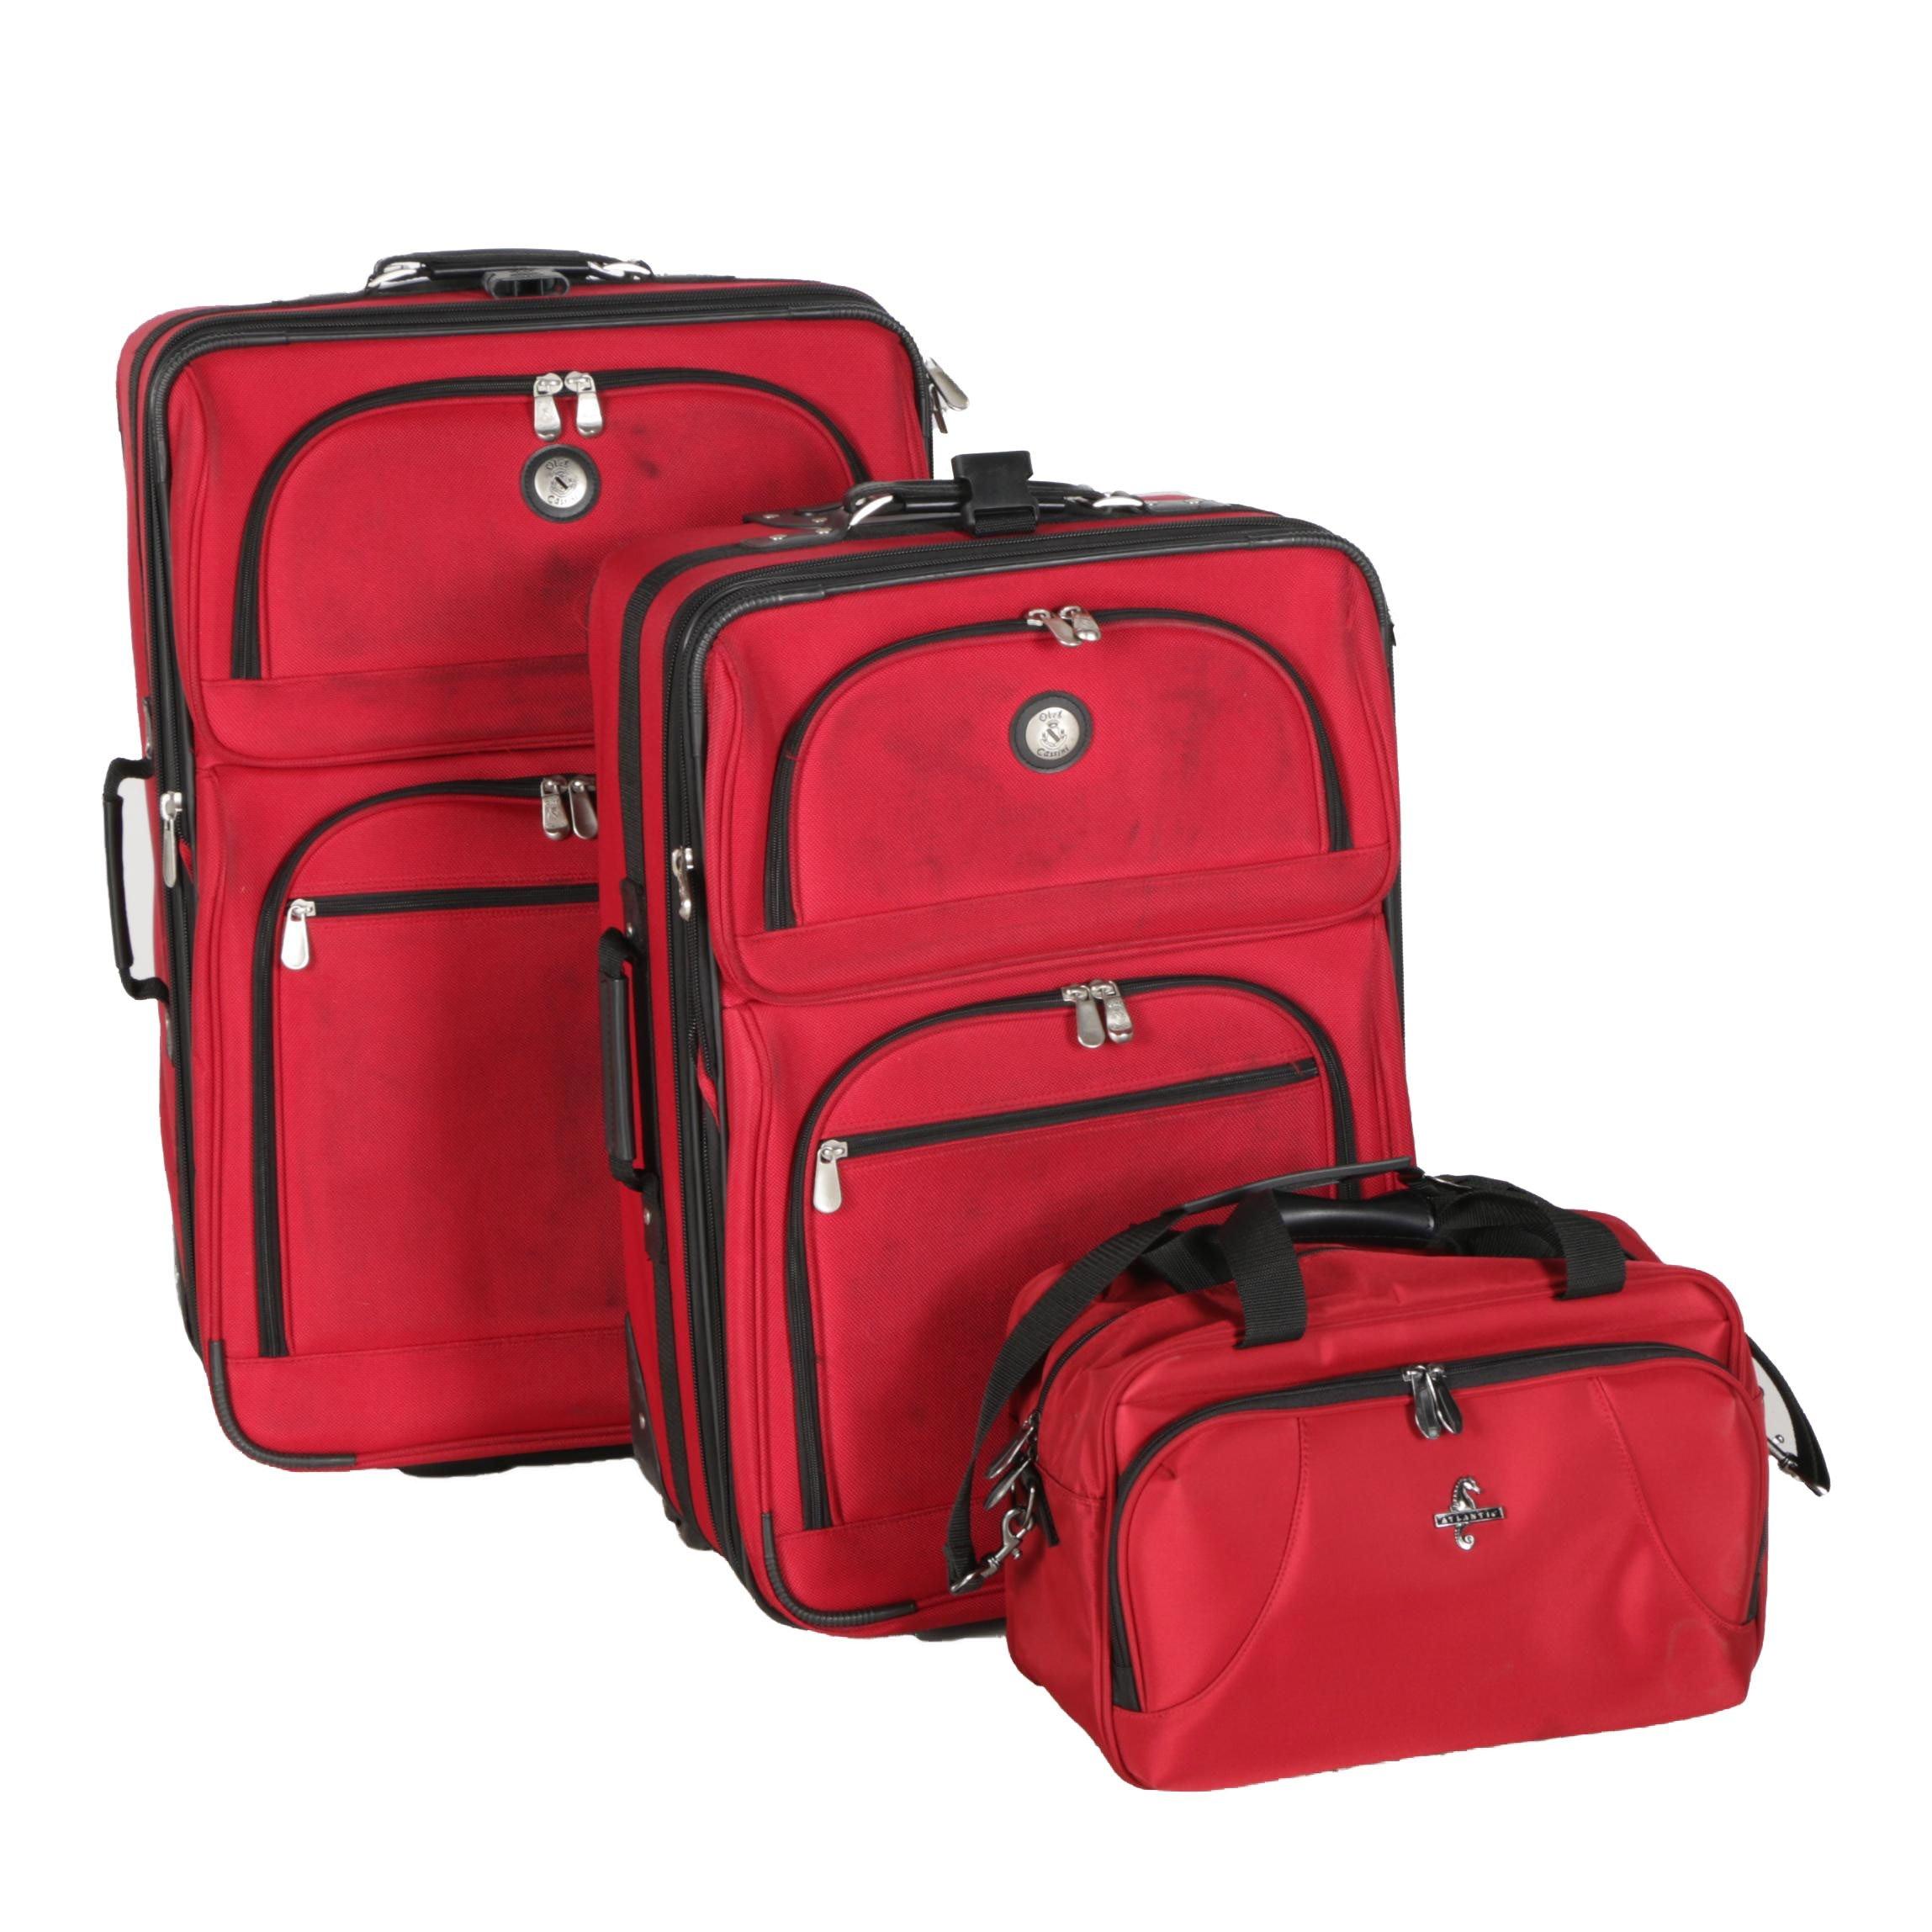 Three-Piece Luggage Set Including Oleg Cassini